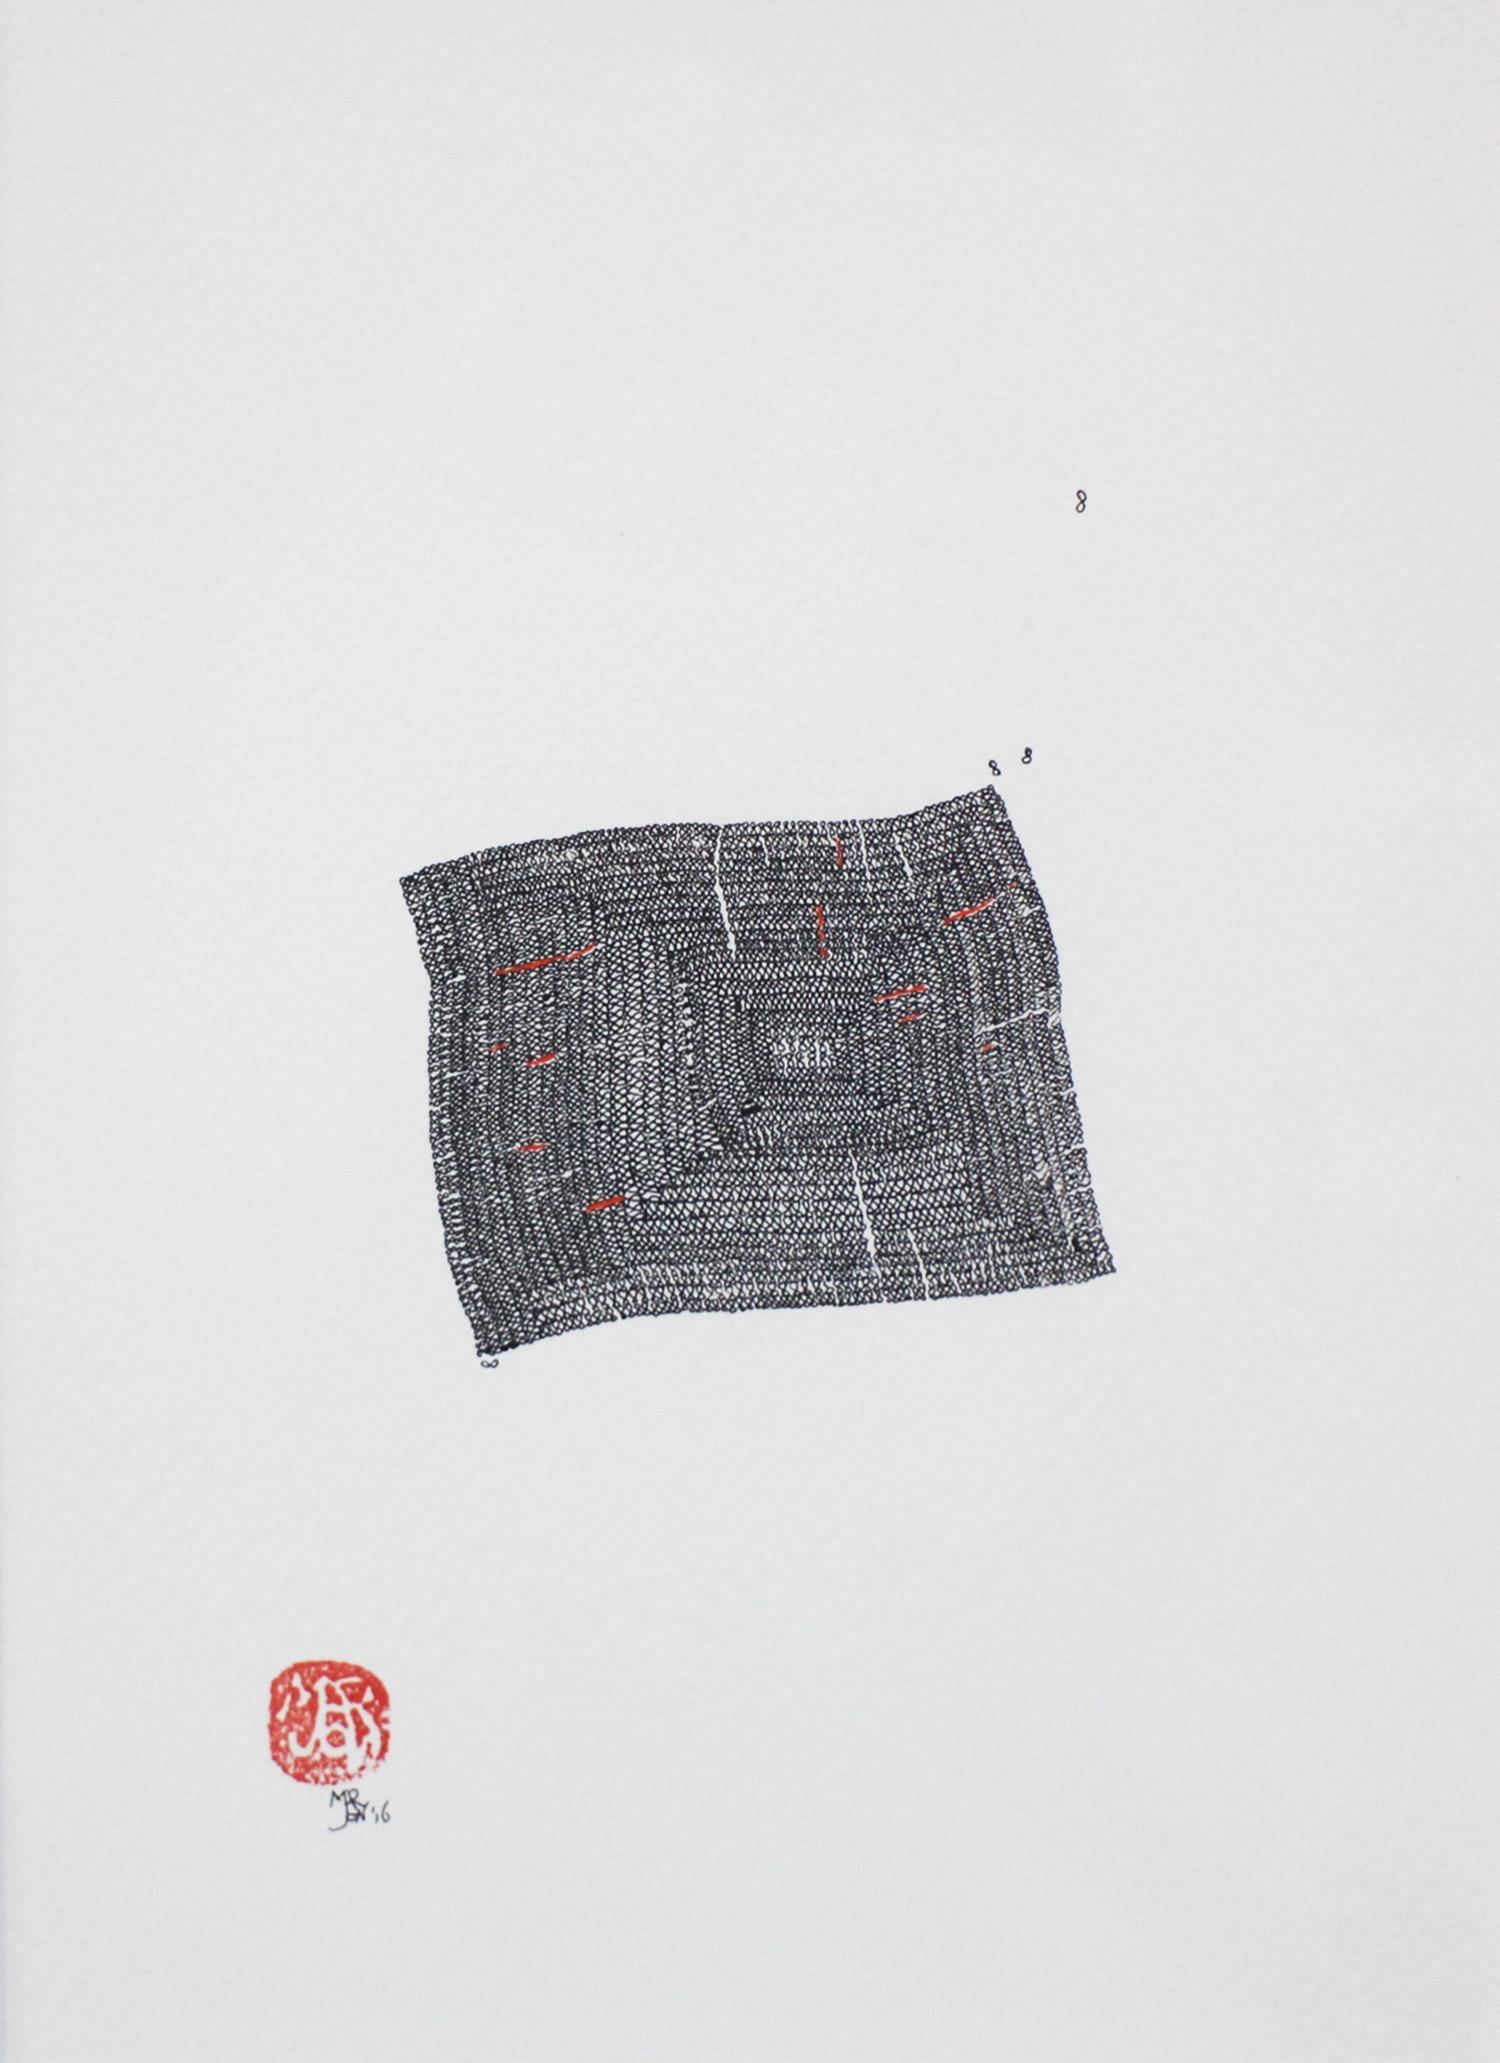 Marjon Barton, Untitled #29 ( 2016), 15x21.5cm, Ink on Paper